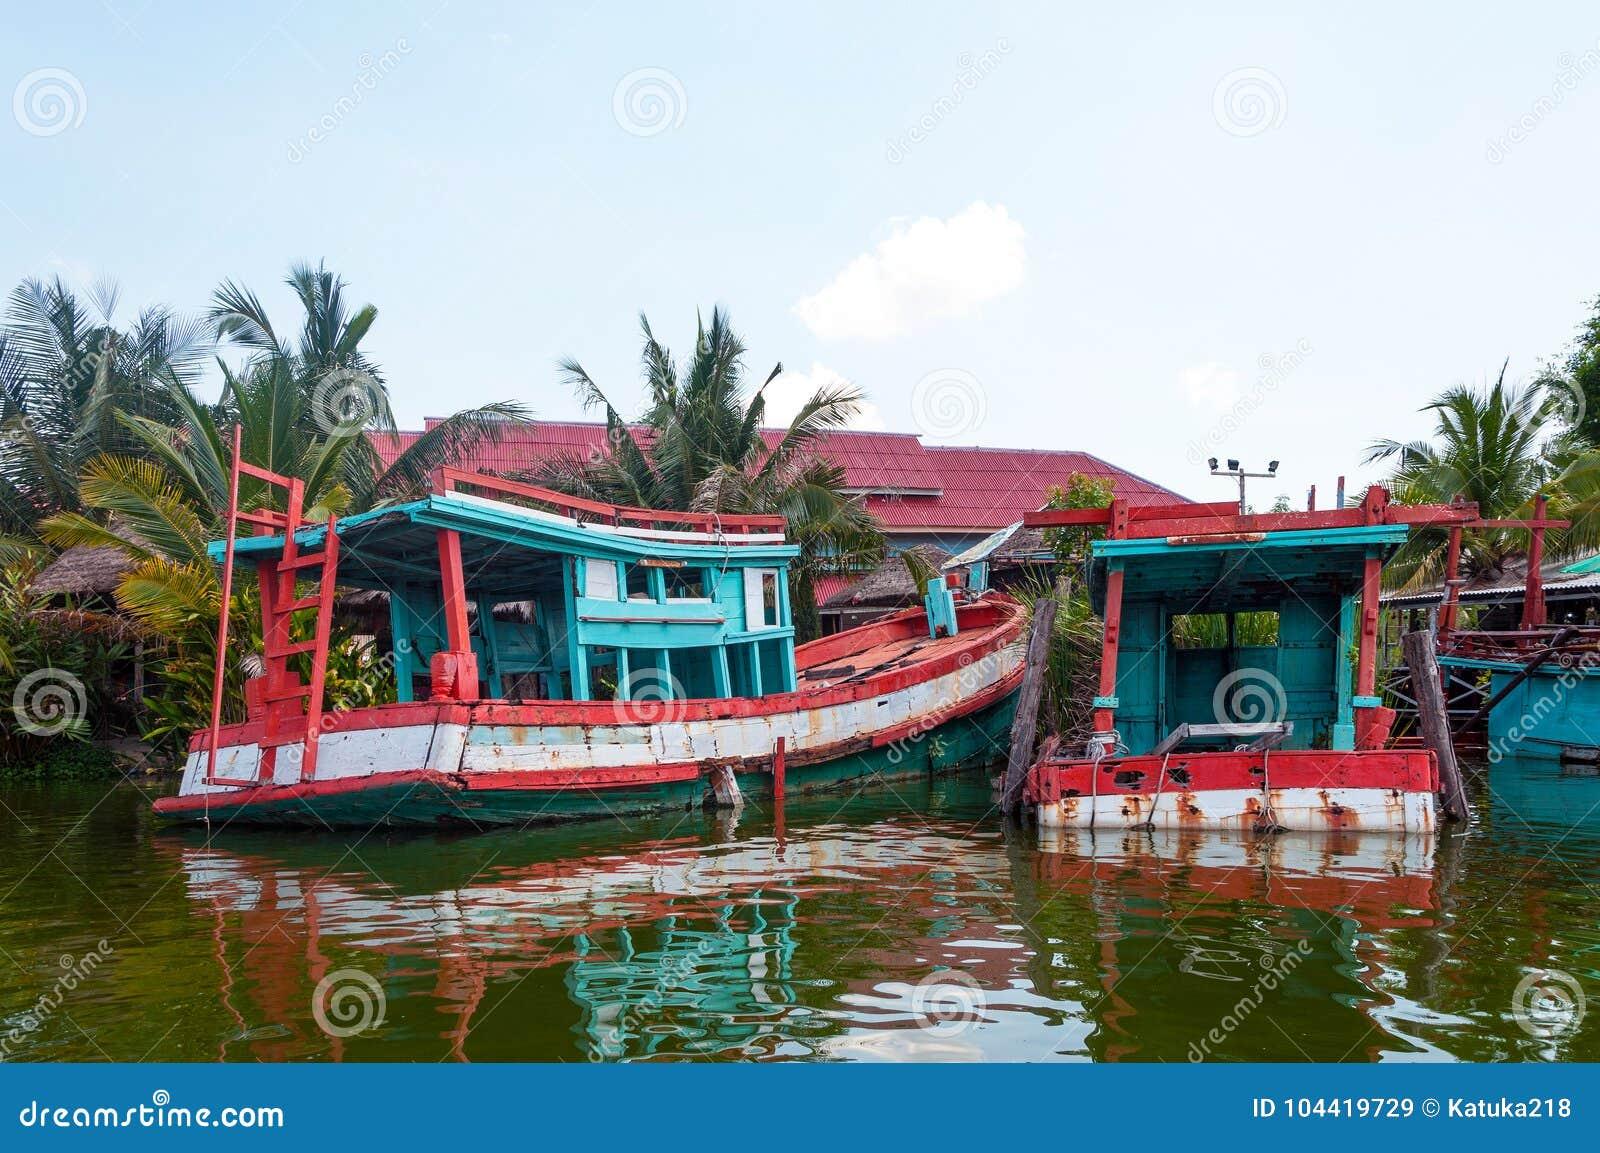 Boot in Hua Hin Floating Market in Hua Hin thailand